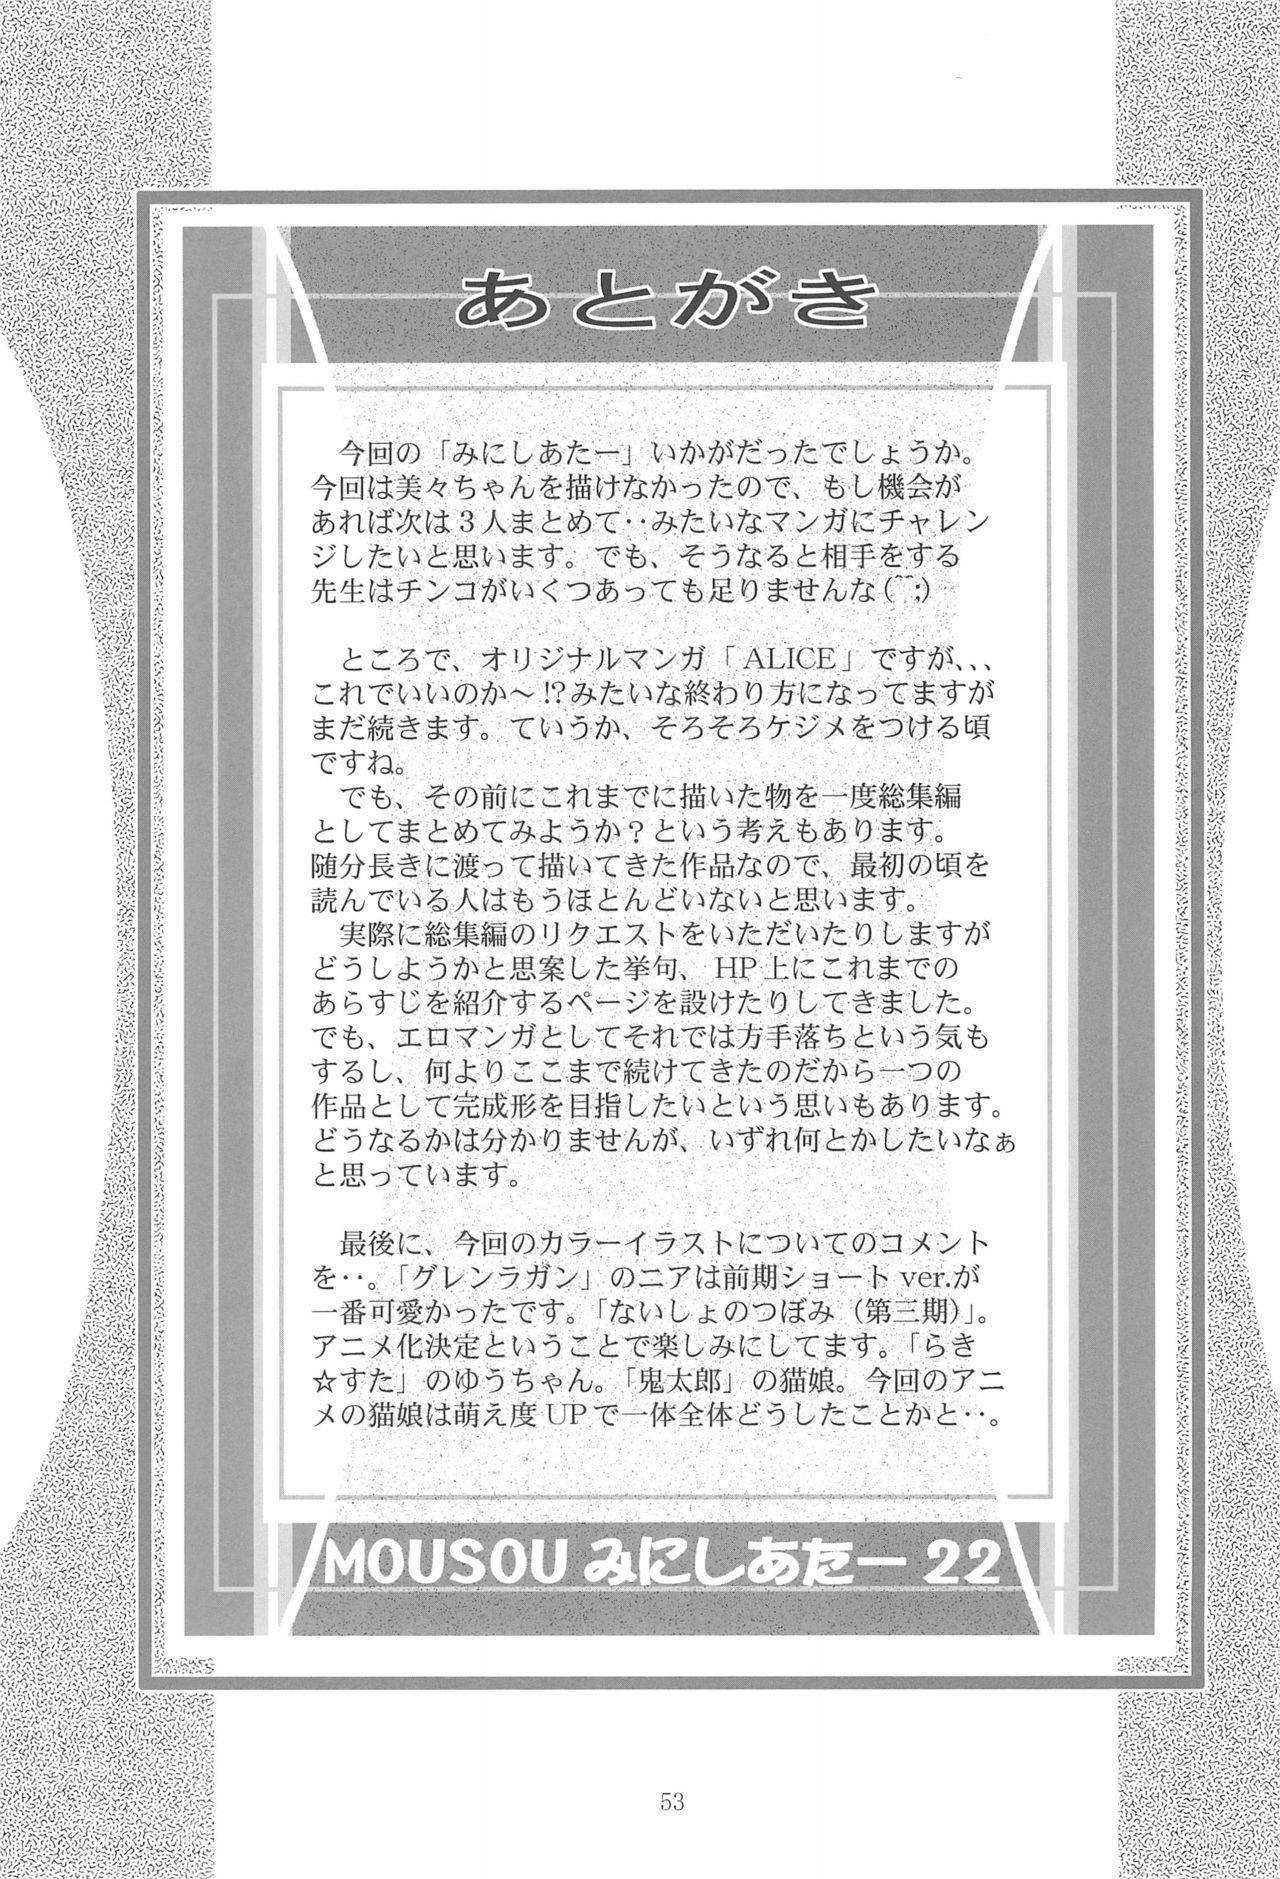 MOUSOU Mini Theater 22 52